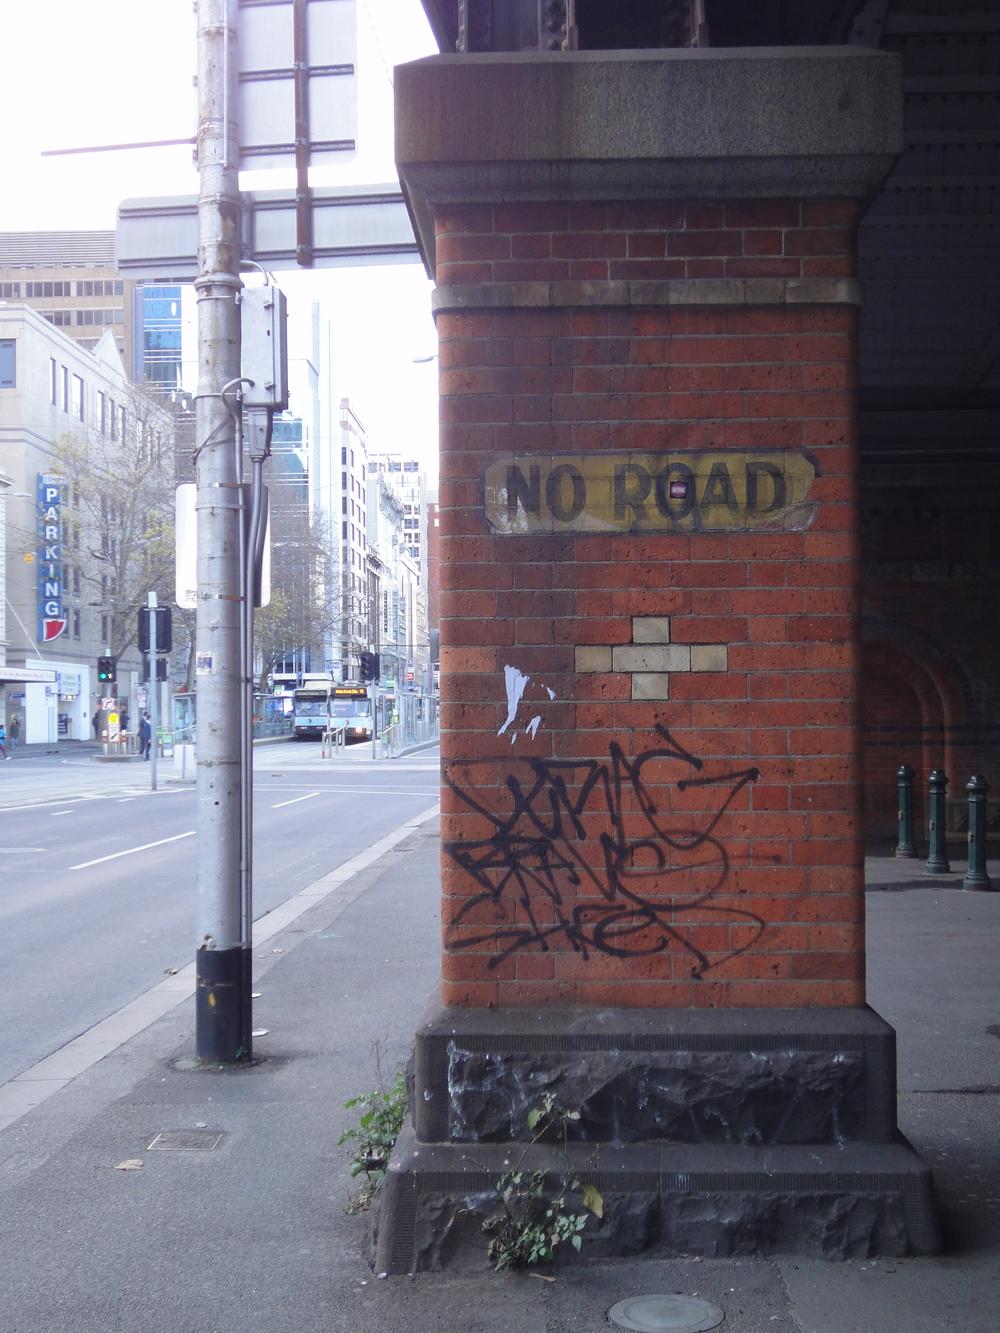 A street sign found near QueensbridgeStreet in Melbourne's CBD